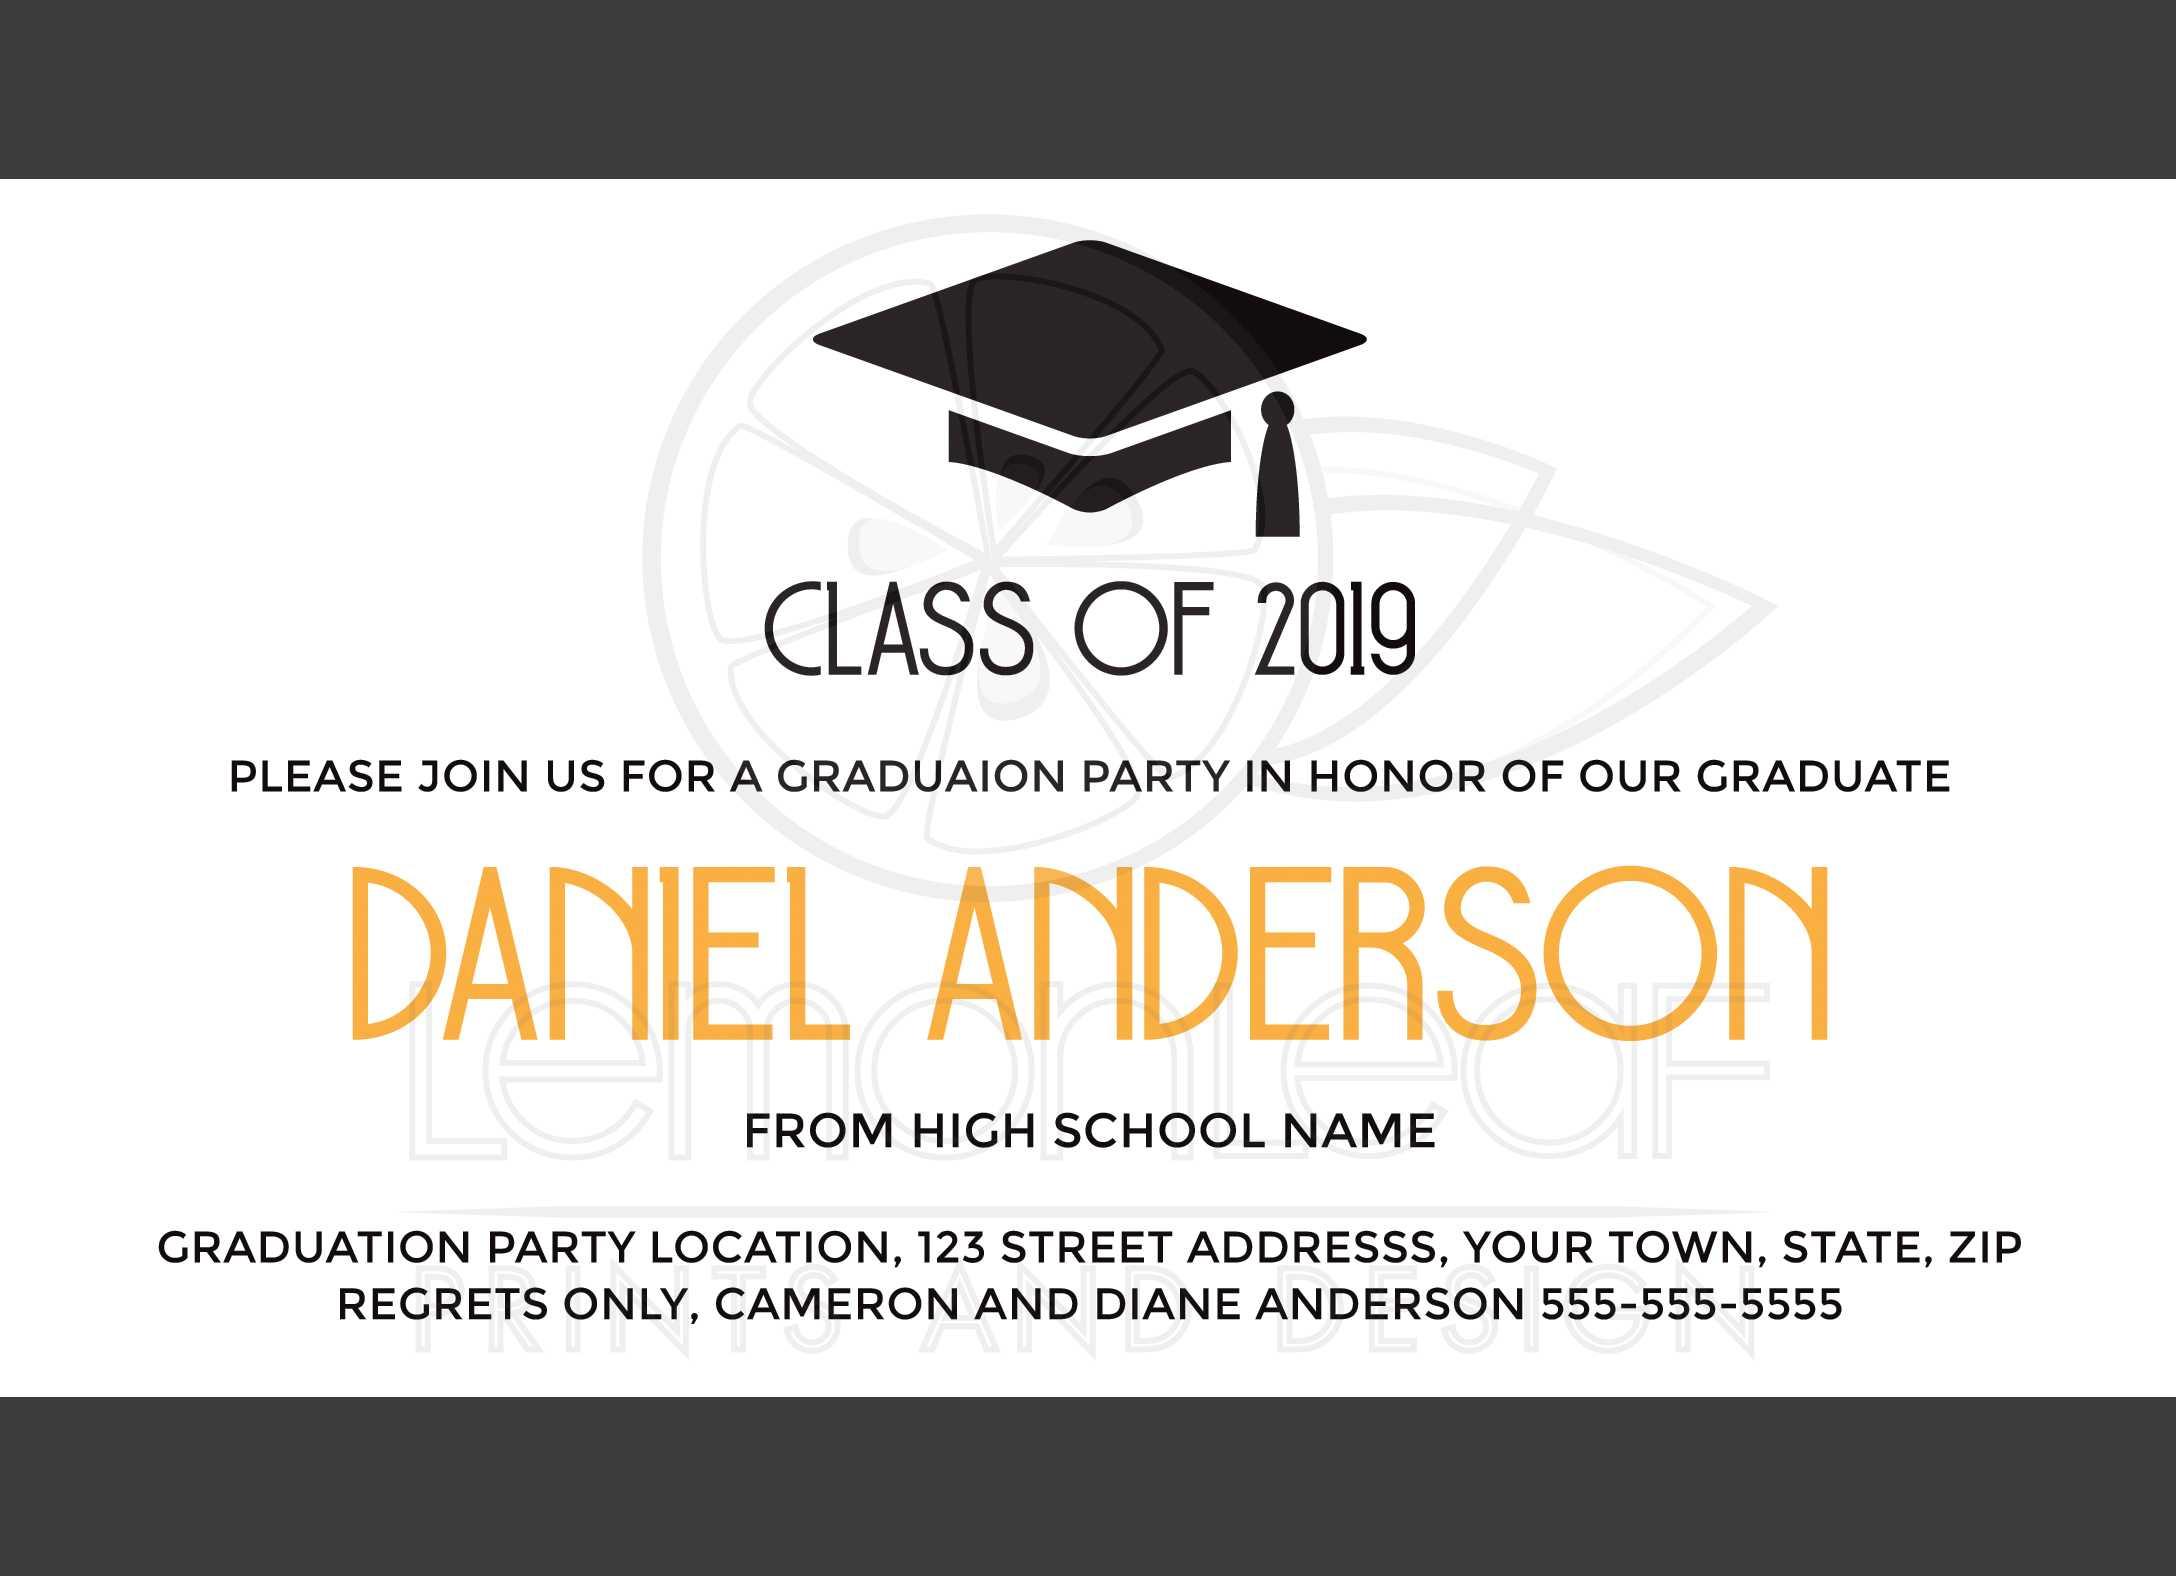 Modern Elegant Graduation Invitation With Mortarboard Hat Cap